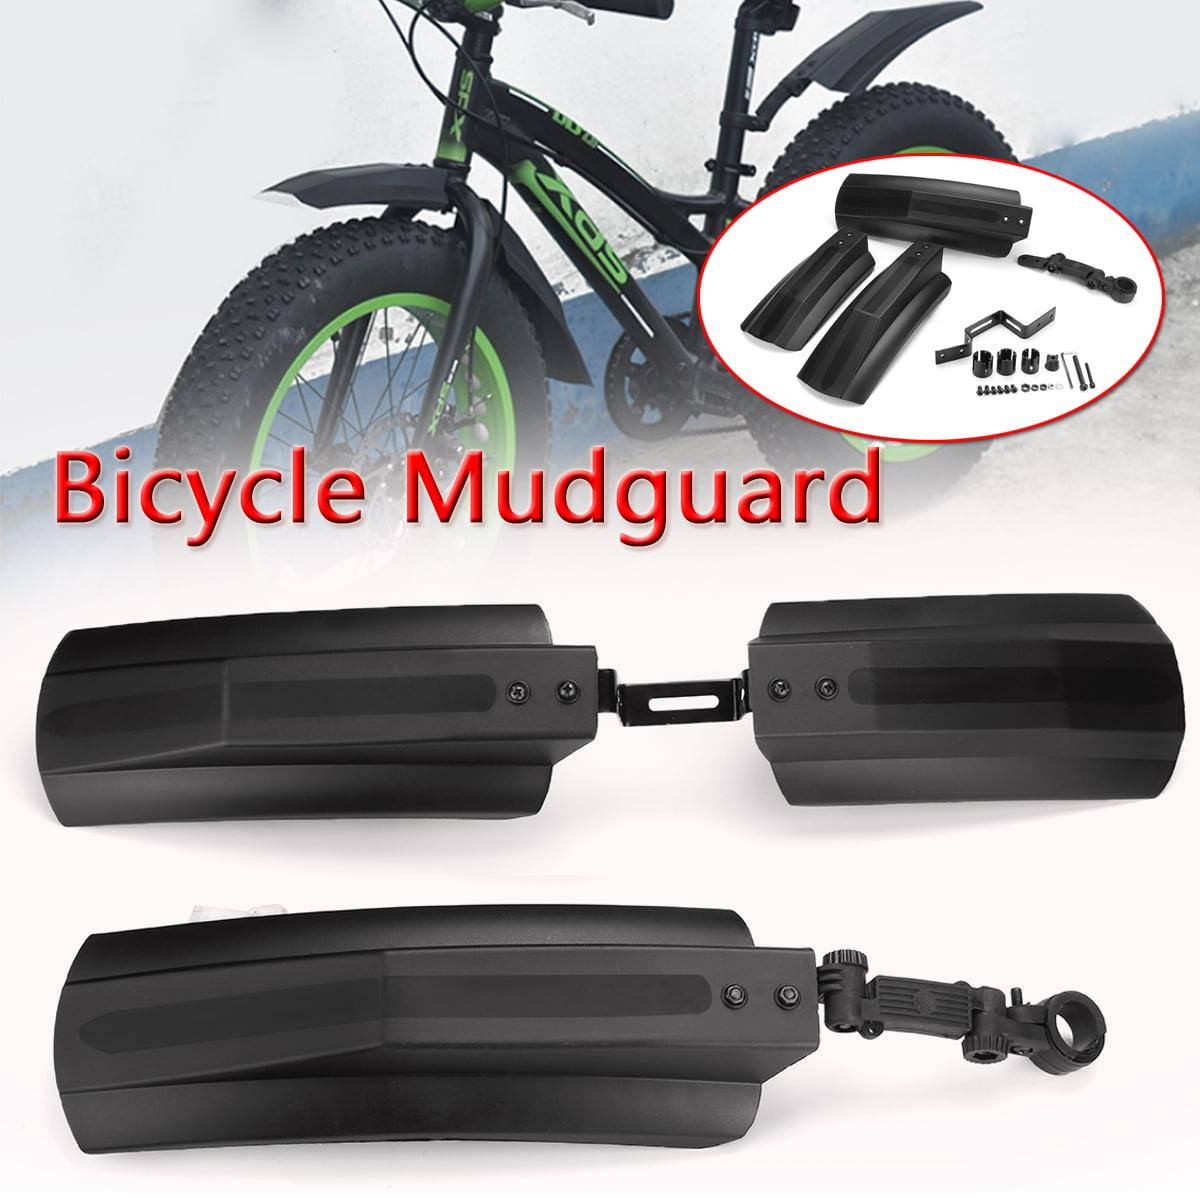 SolUptanisu ycle Fenders Mudguard Set,Wake Front Rear Mudguard Fender Set Mudguard Bike Mud Guard Fender for Cycling Mountain Road Bike MTB Mountain Bike F05